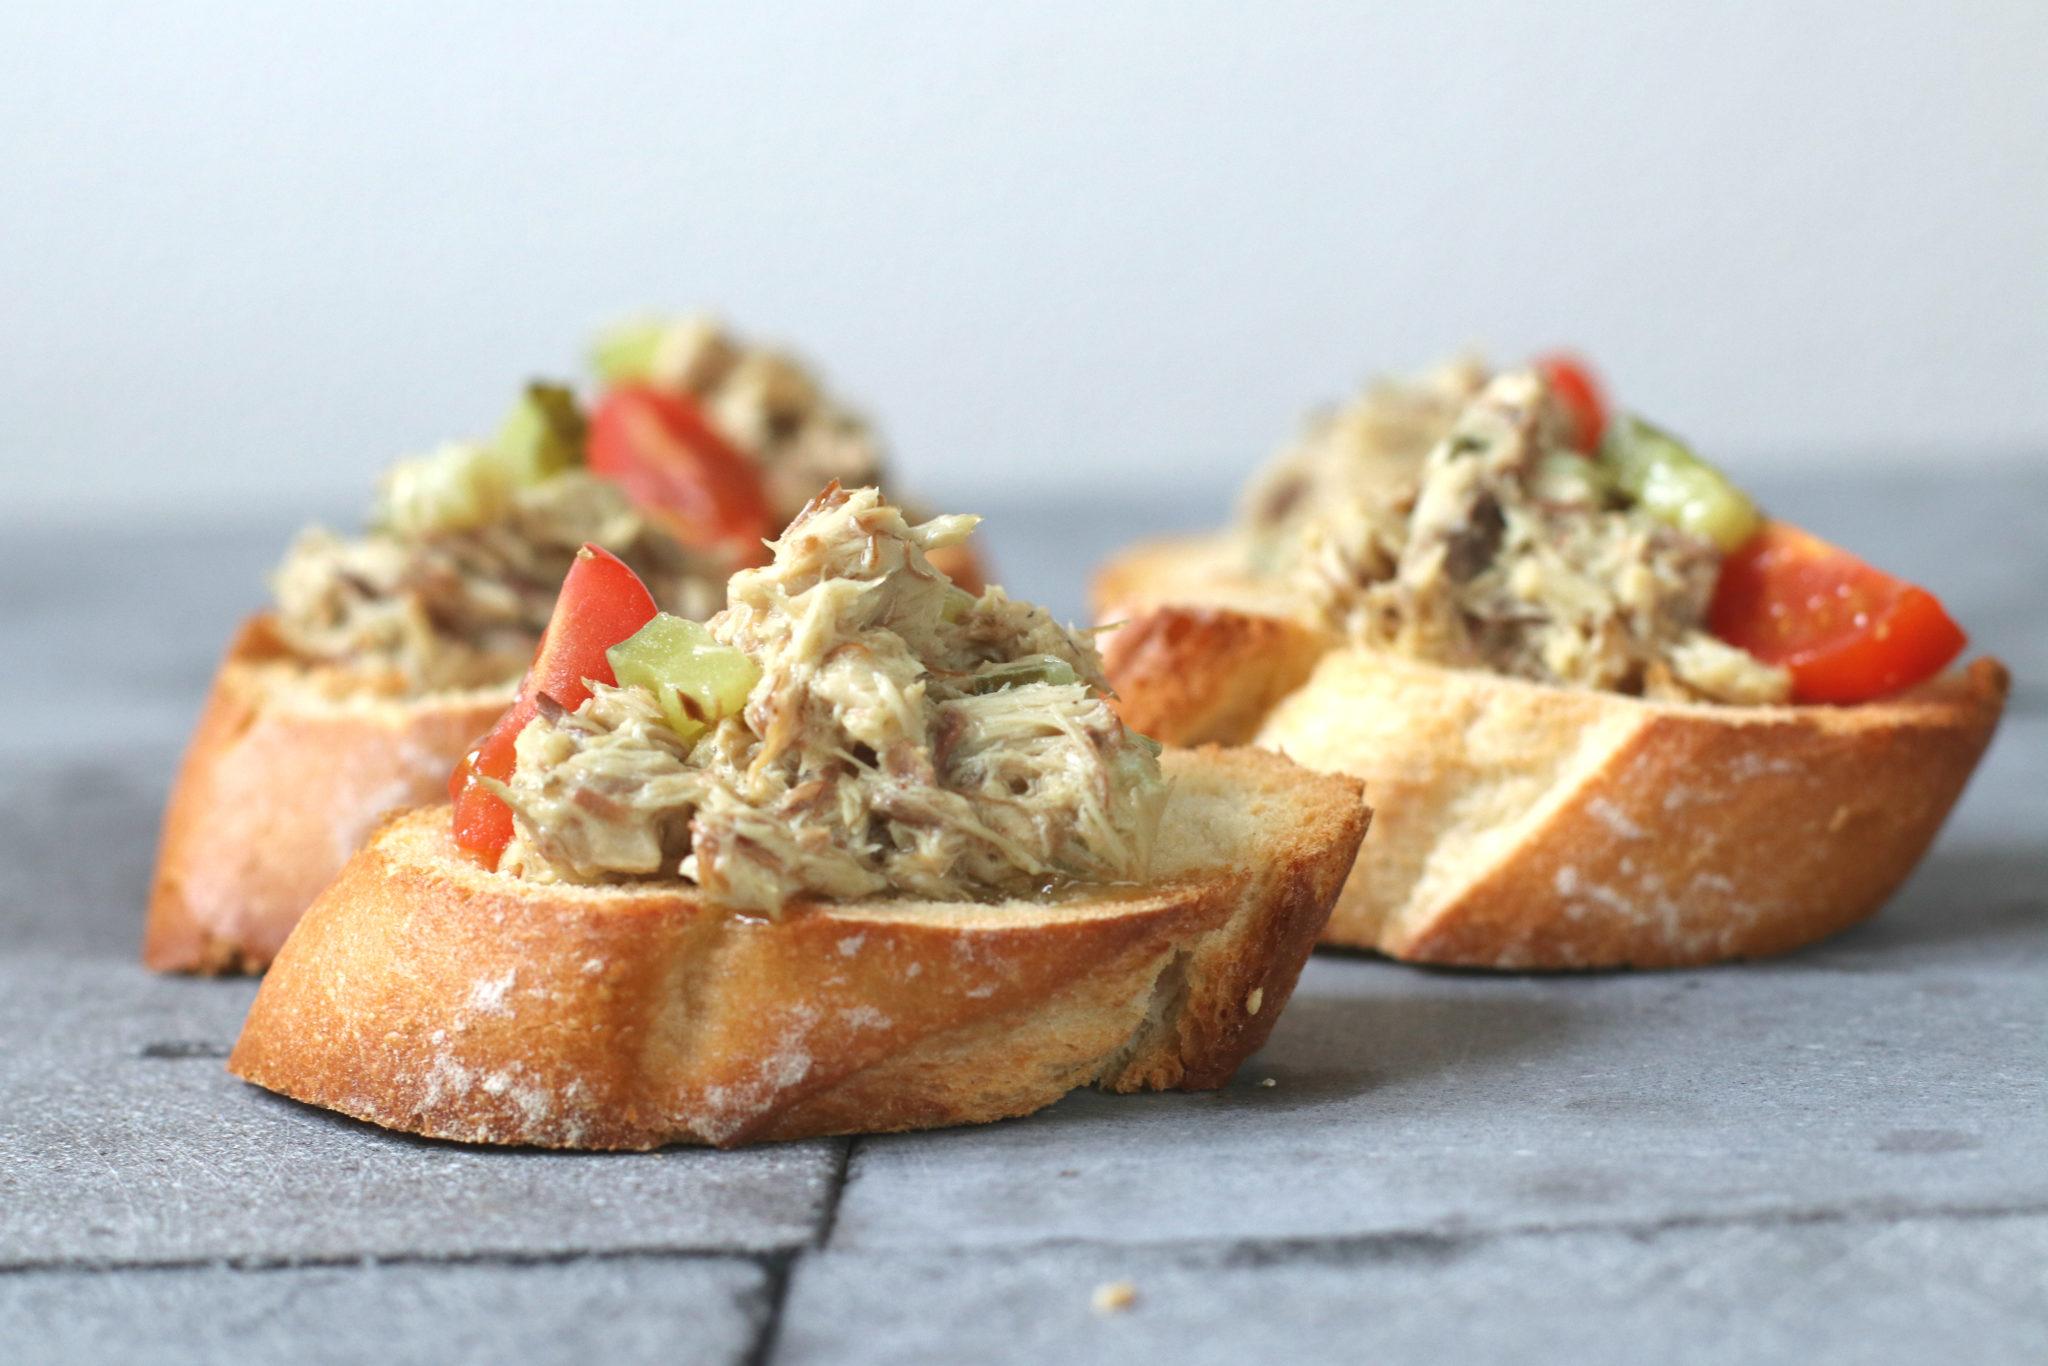 Makreel salade recept snel www.jaimyskitchen.nl